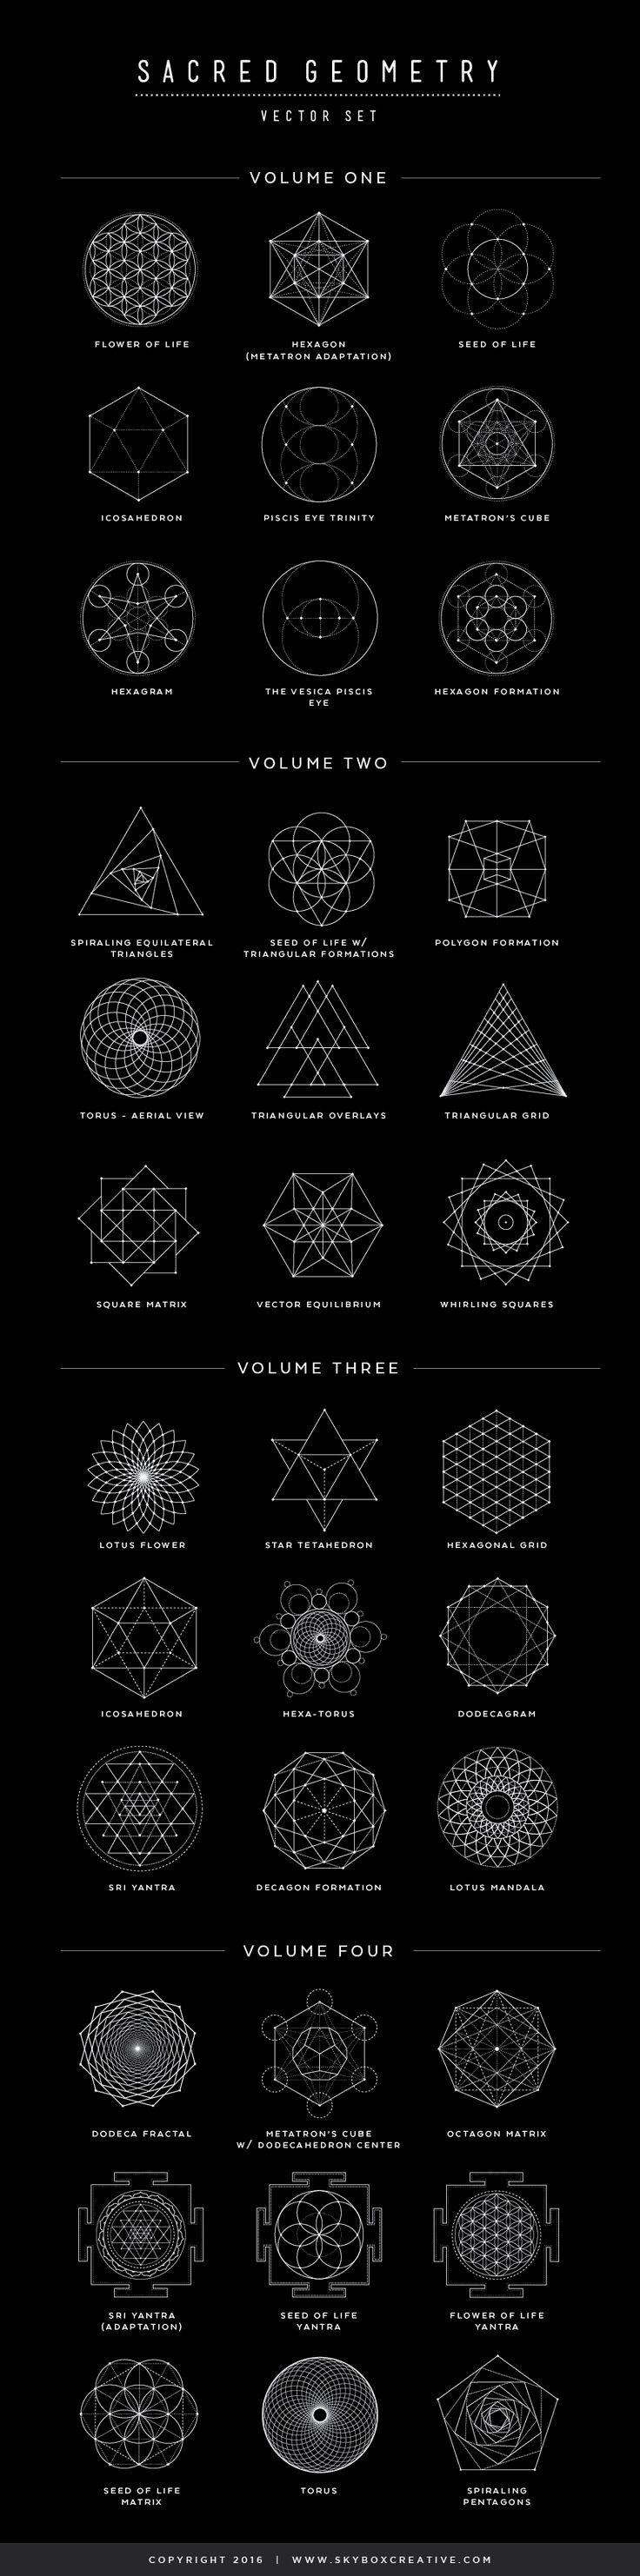 tattoo  sacred geometry symbols their names and meanings  large   Geometric tattoo  sacred geometry symbols their names and meanings  great tattoo   Geo Geometric tattoo...